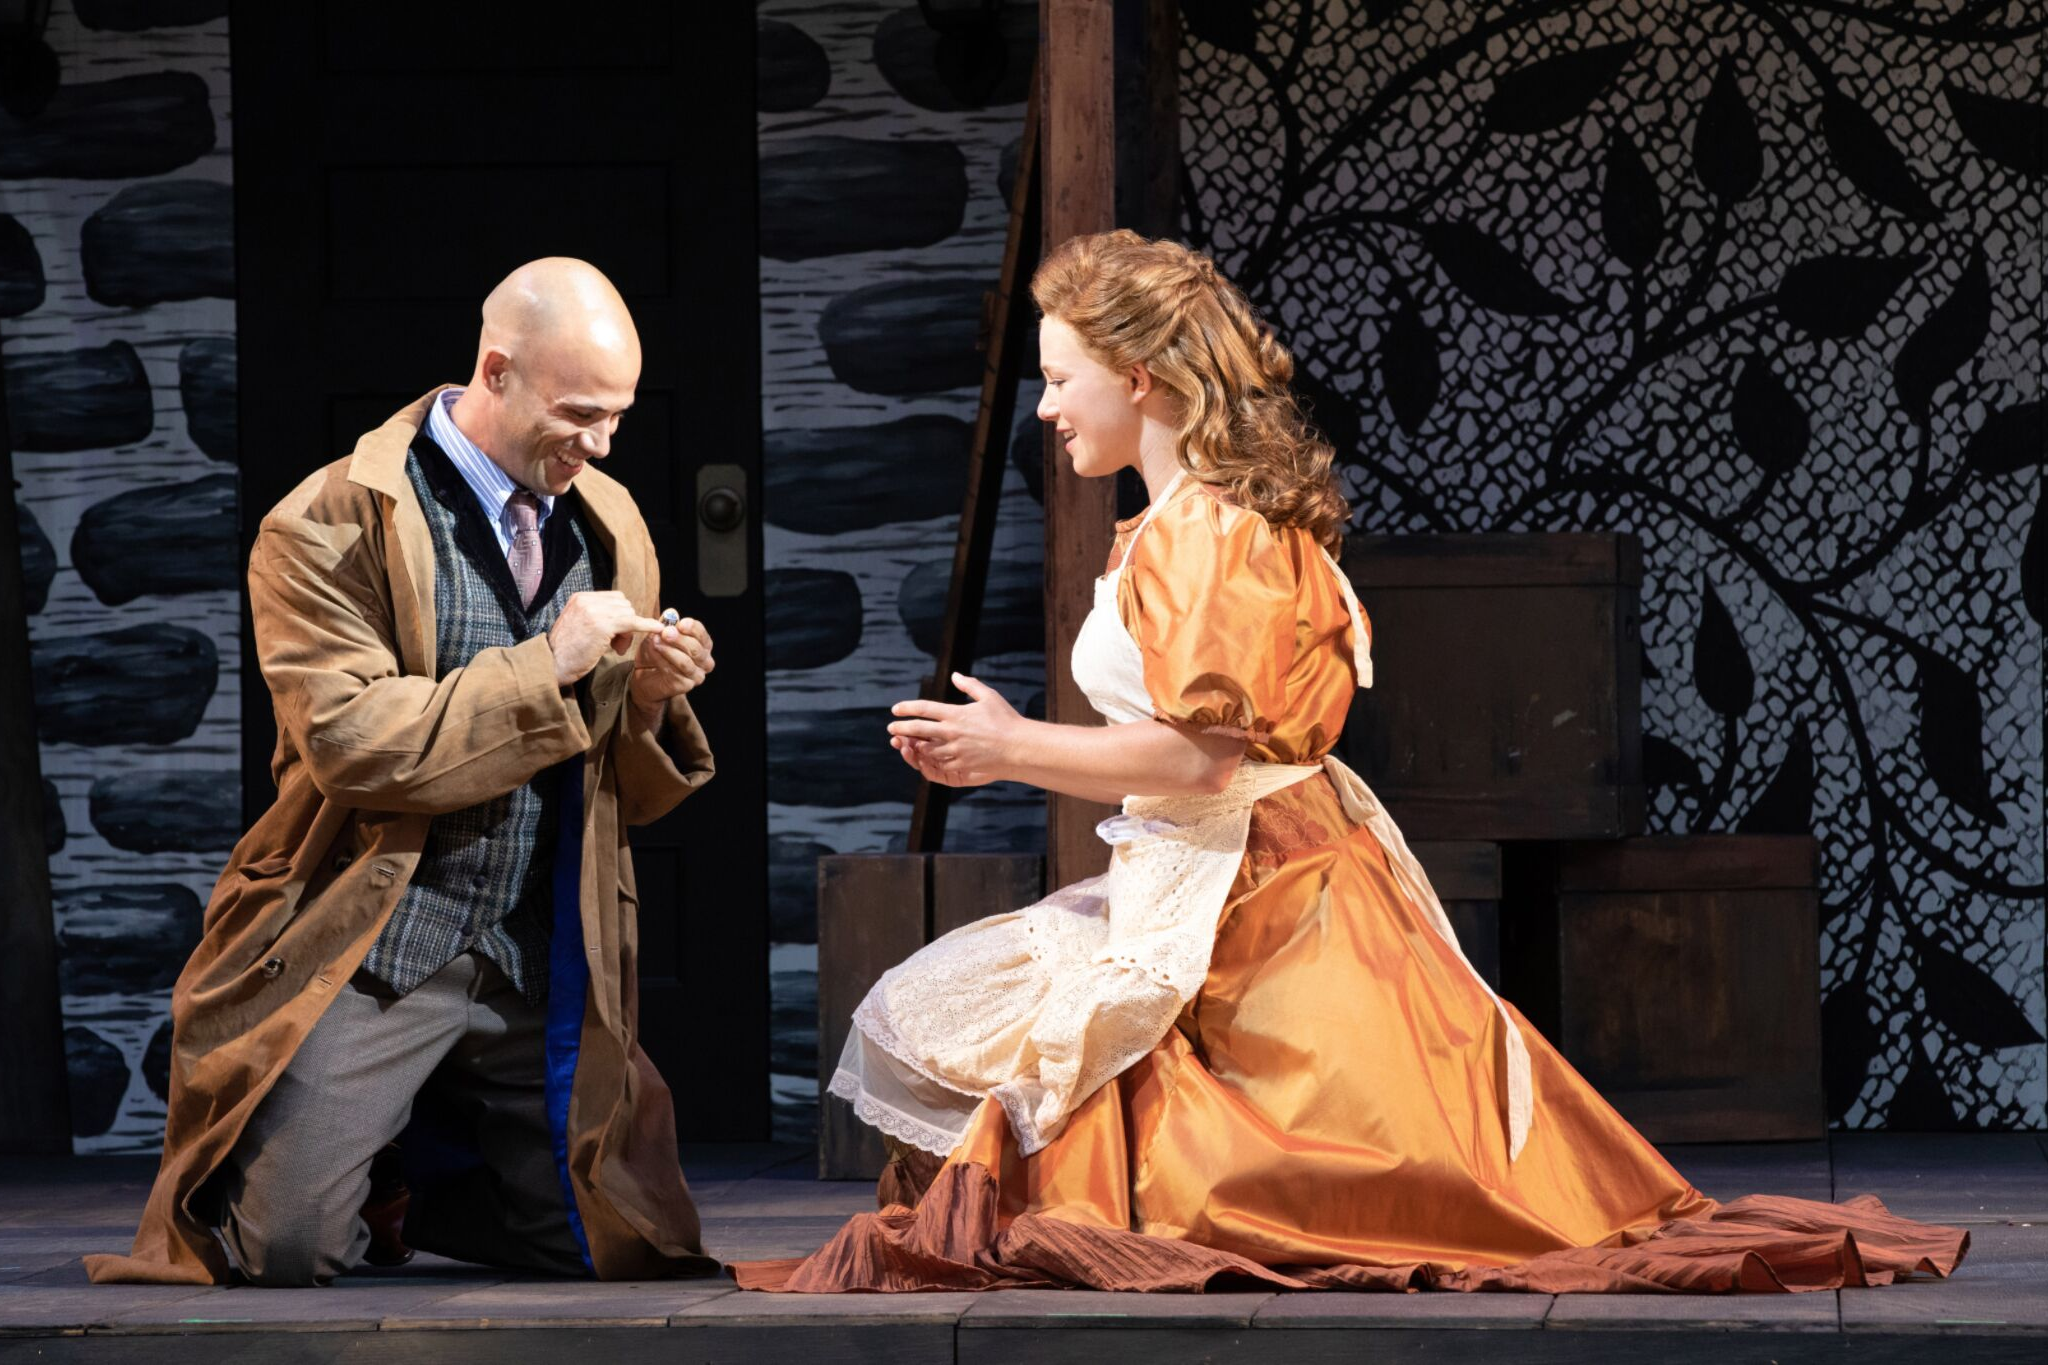 Daniel Duque-Estrada (Posthumus) and Nora Eschenheimer (Imogen) in Cymbeline, Shakespeare on the Common 2019-Photo by Evgenia Eliseeva